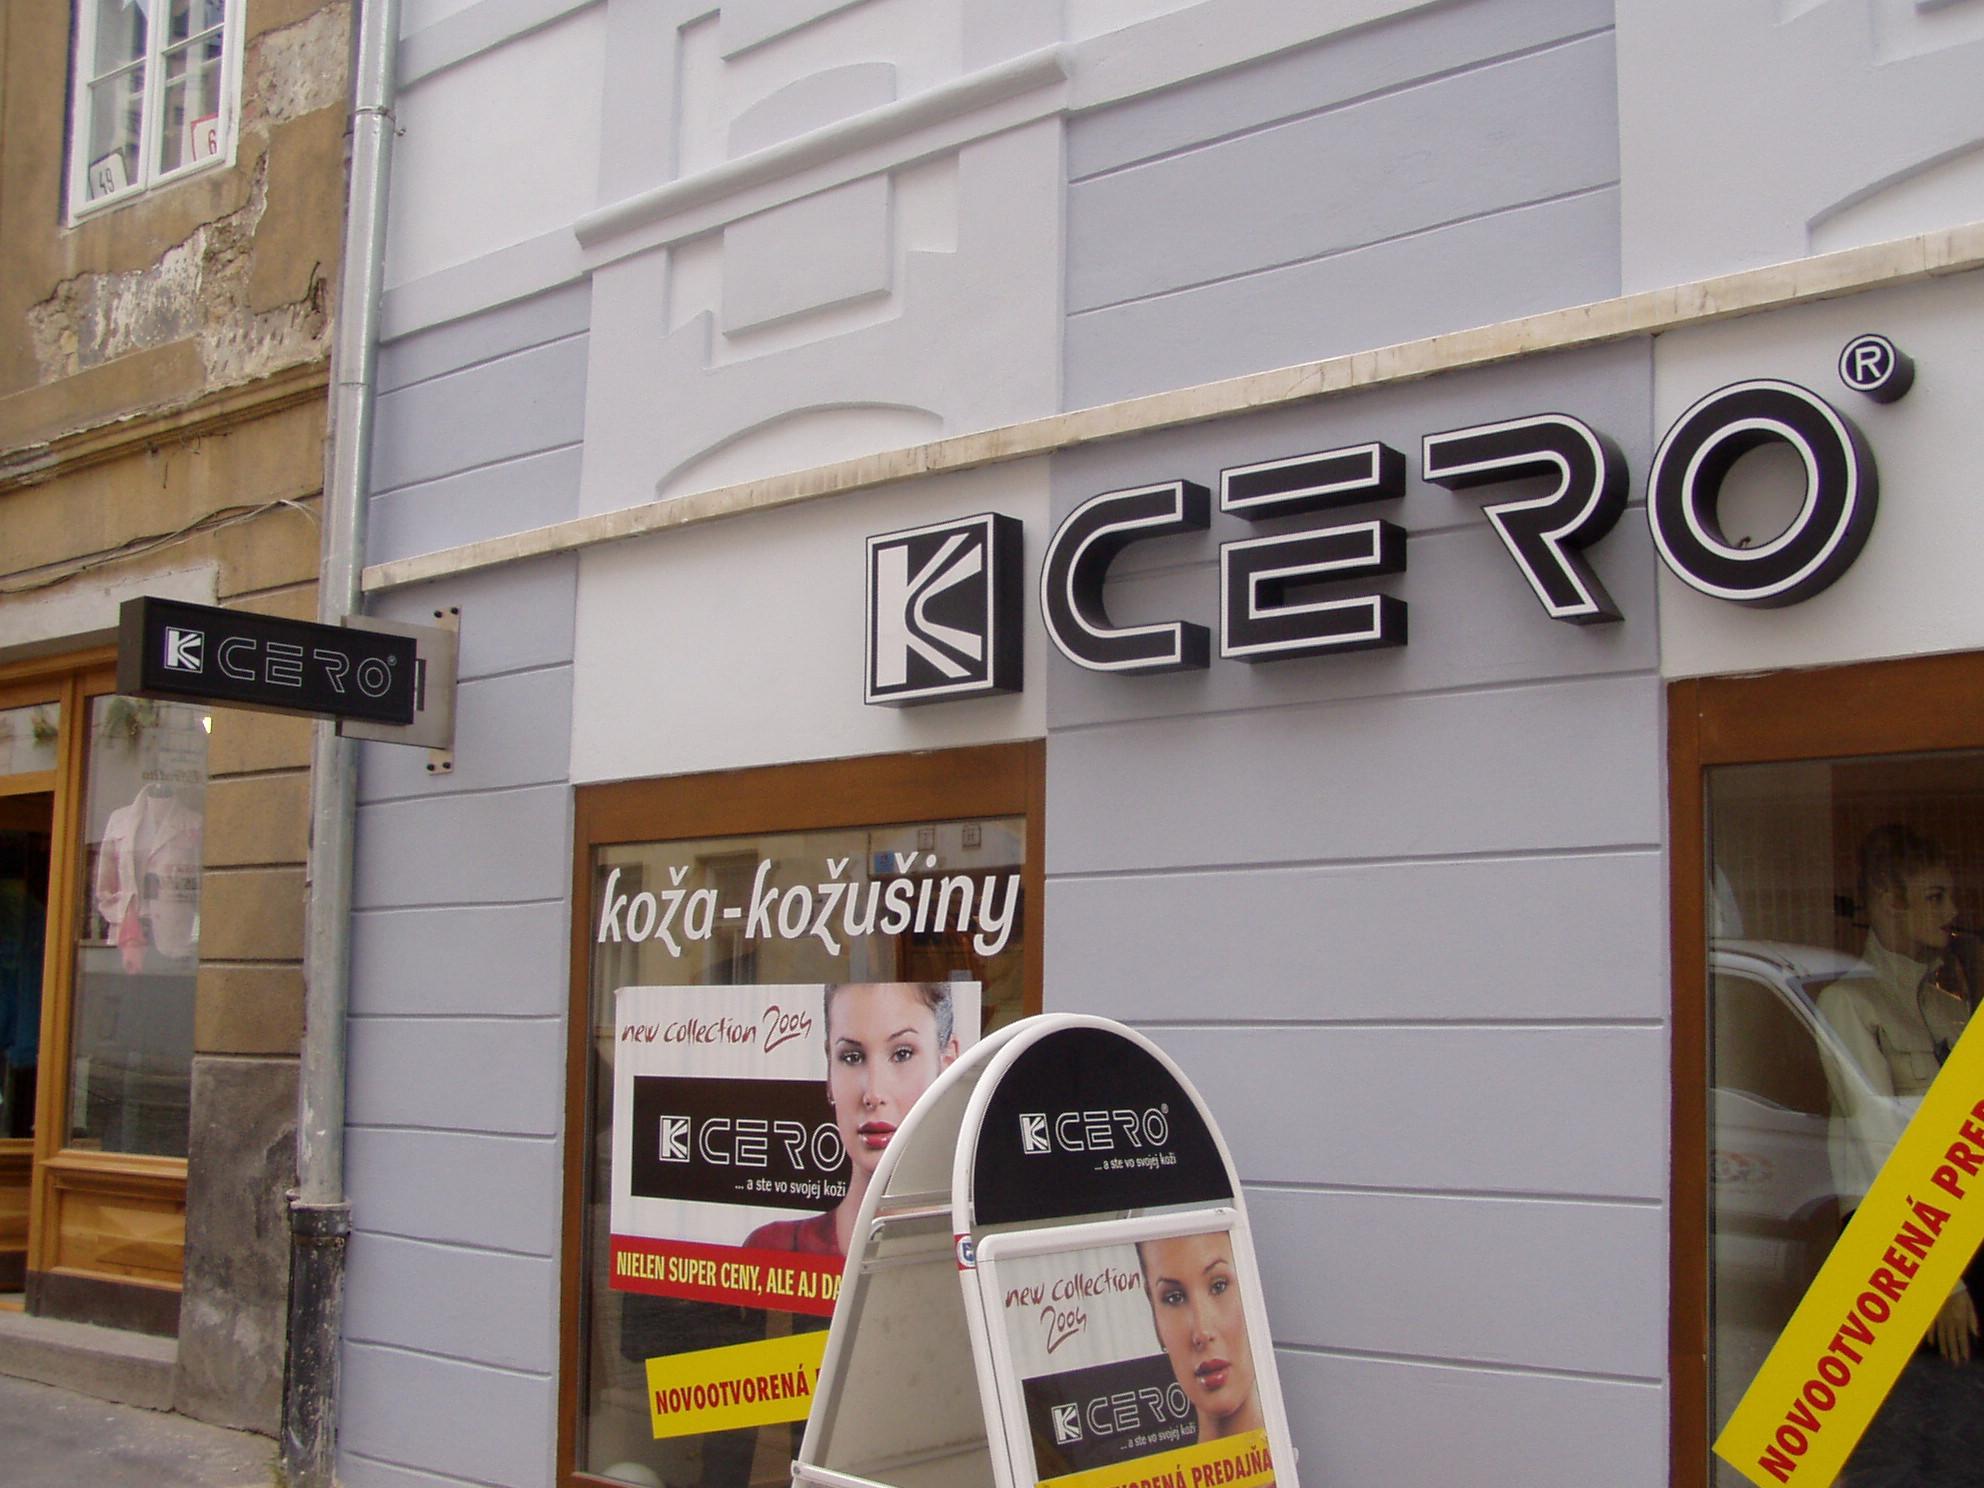 K CERO - Trenčín 2